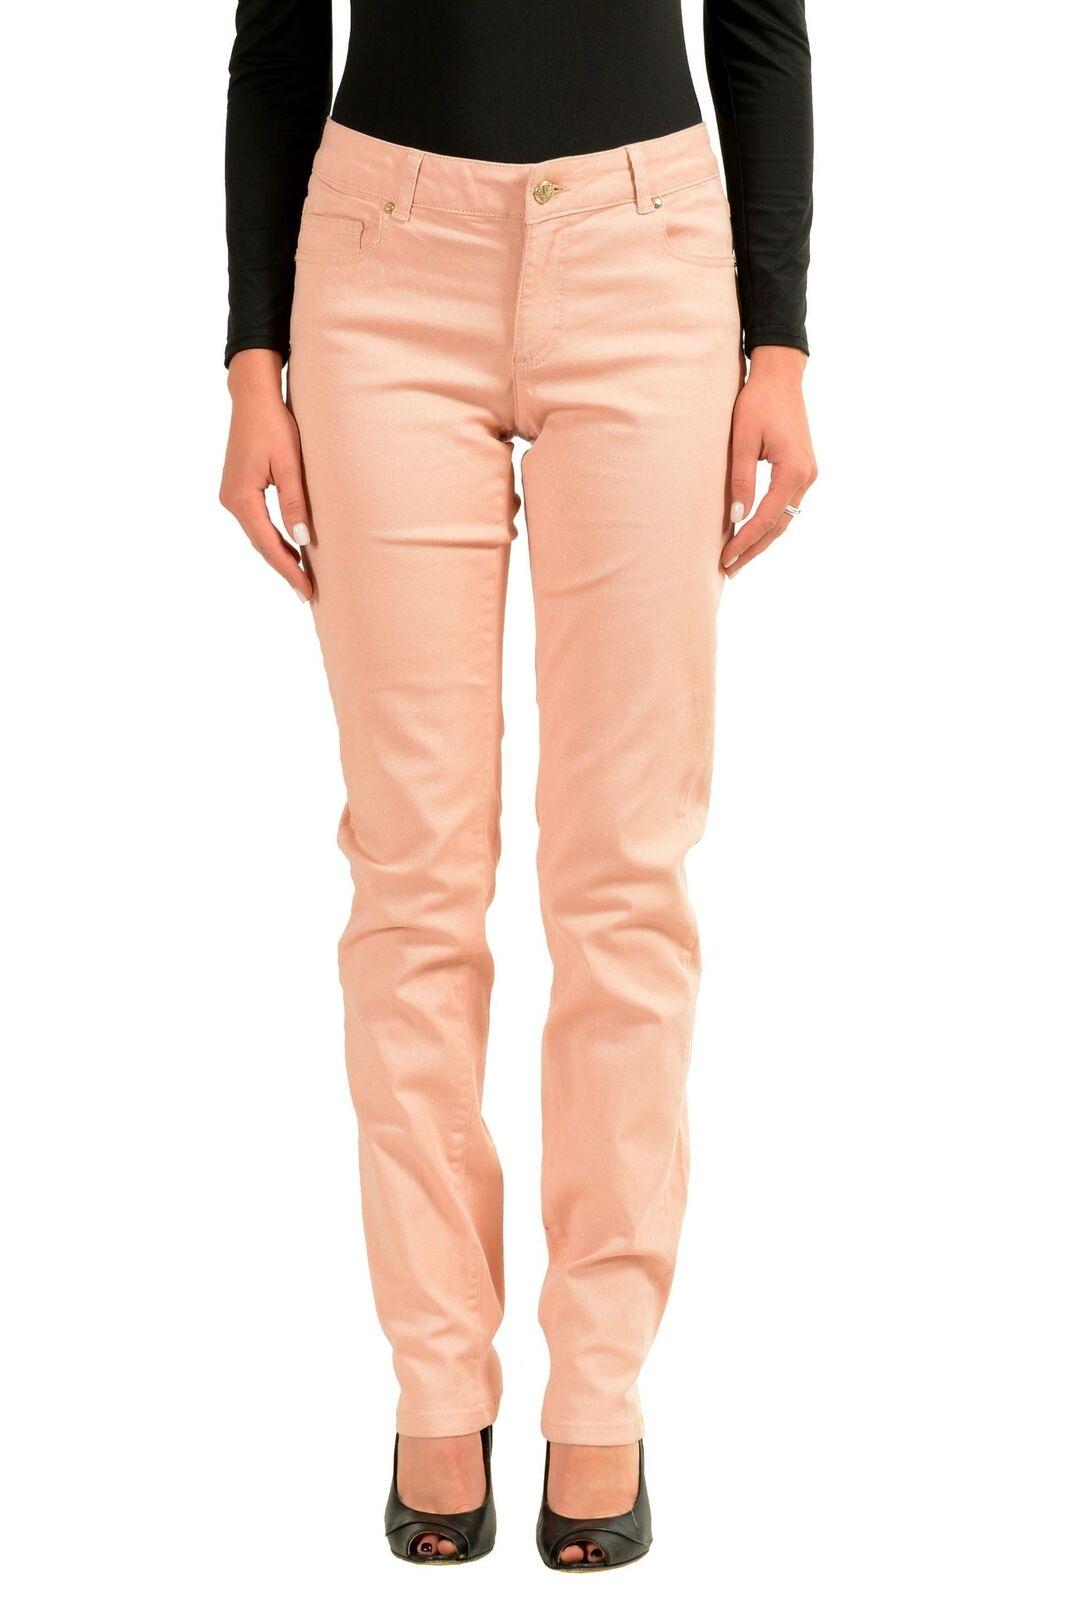 Versace Jeans Sparkling Pink Women's Skinny Jeans Sz 4 5 7